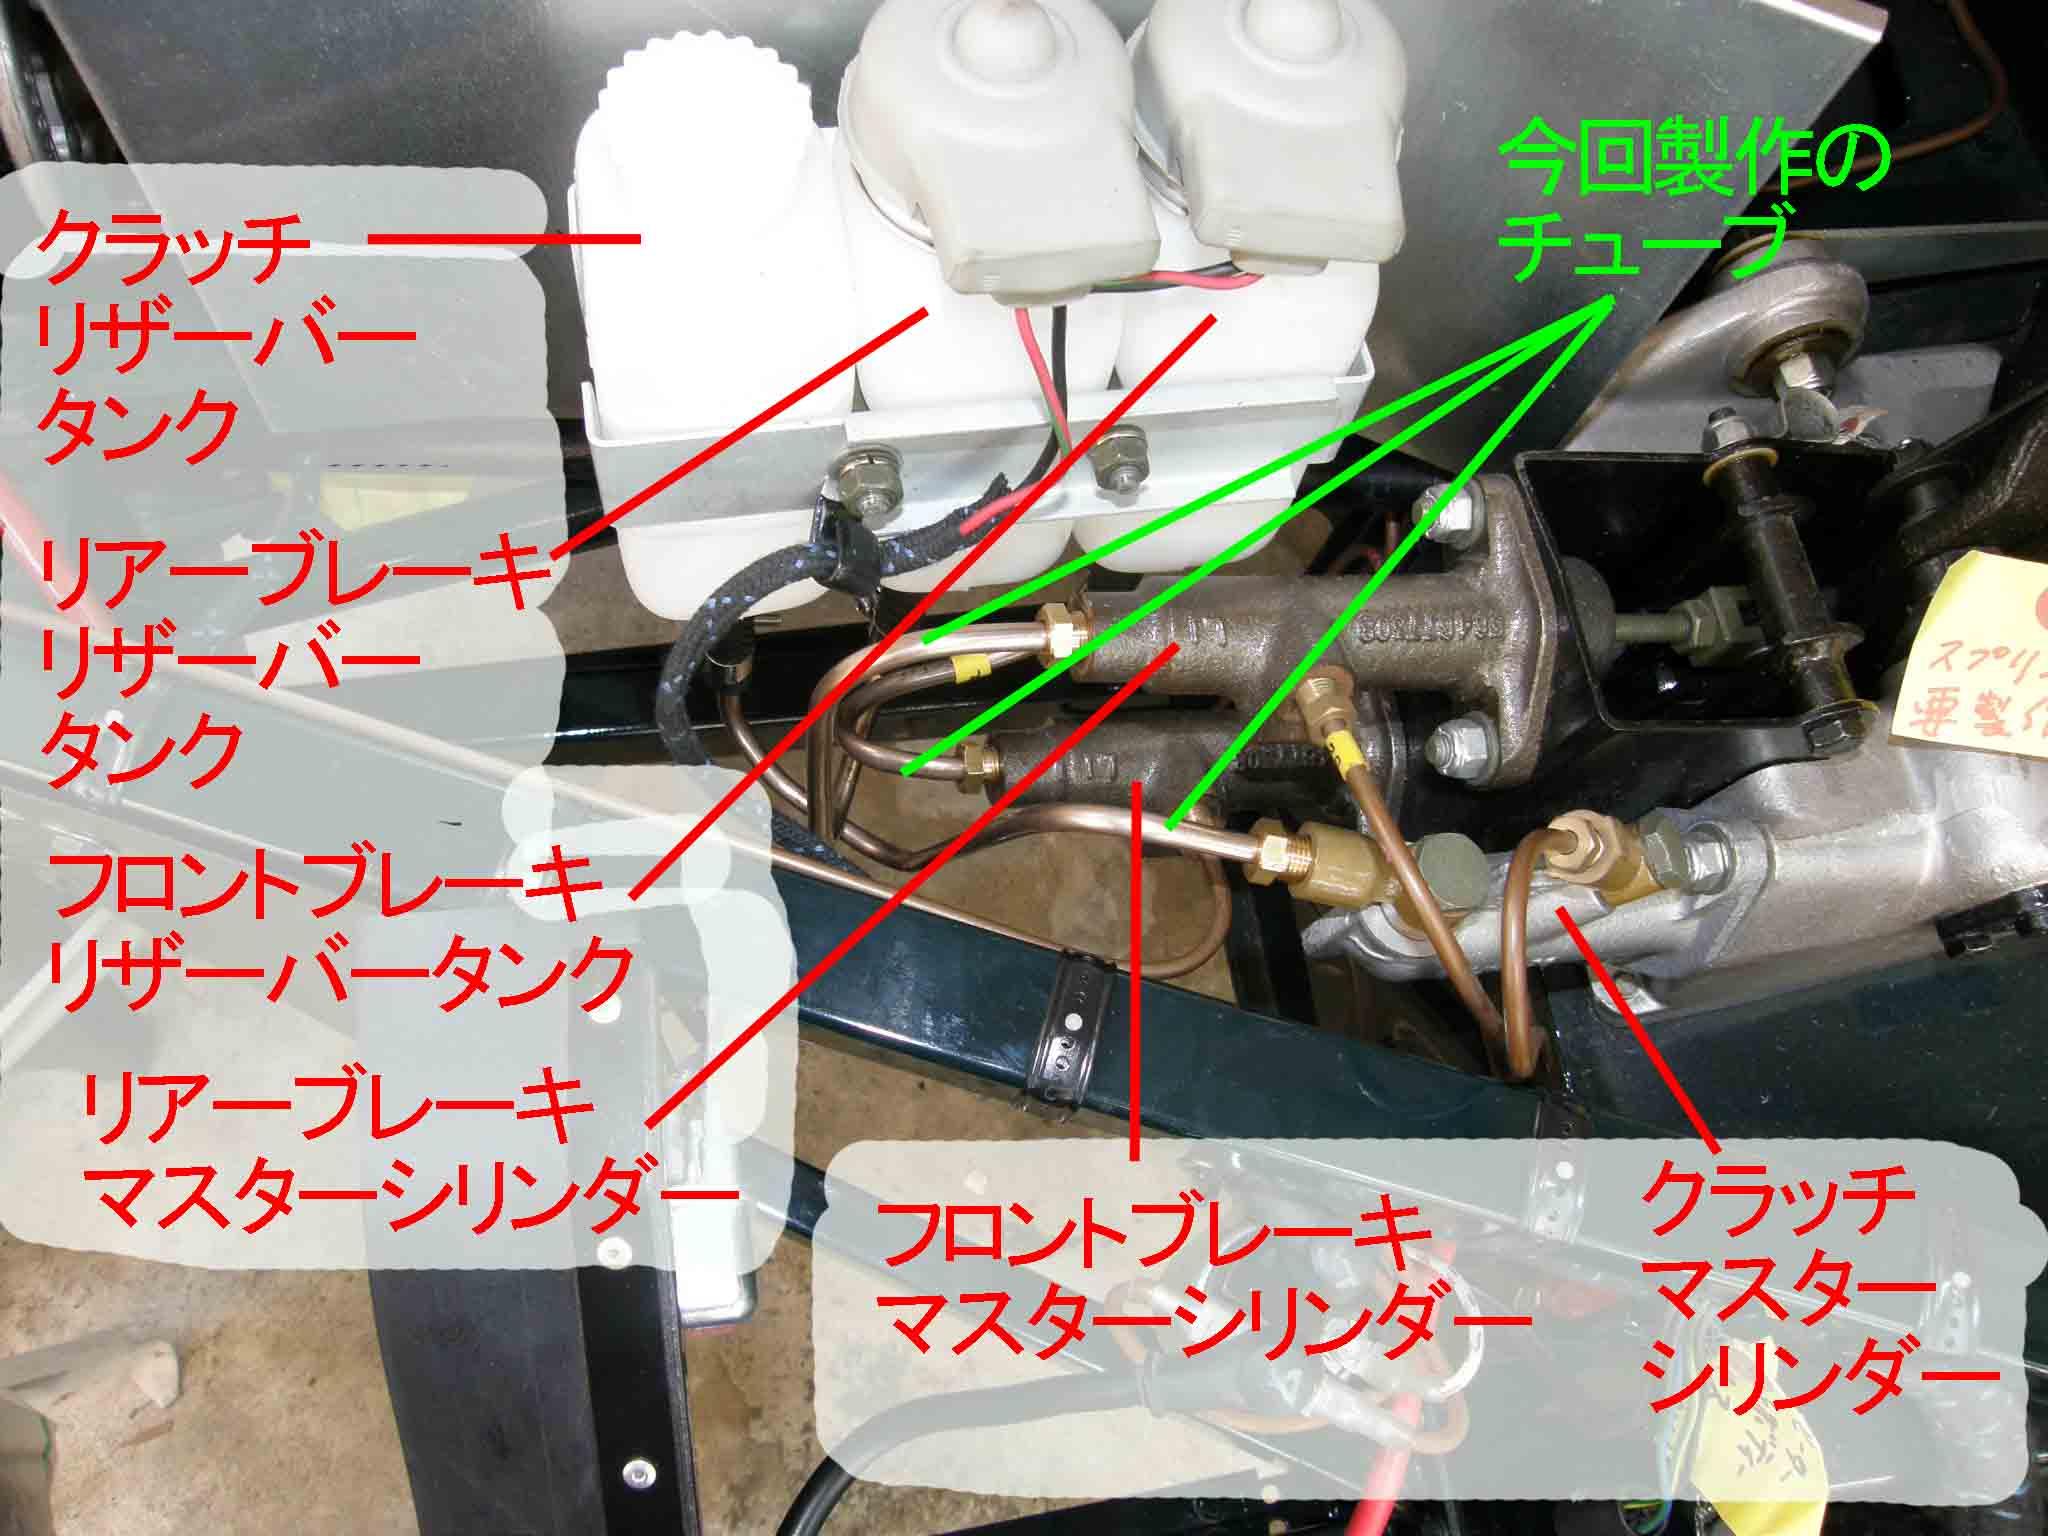 blogP8160121.jpg